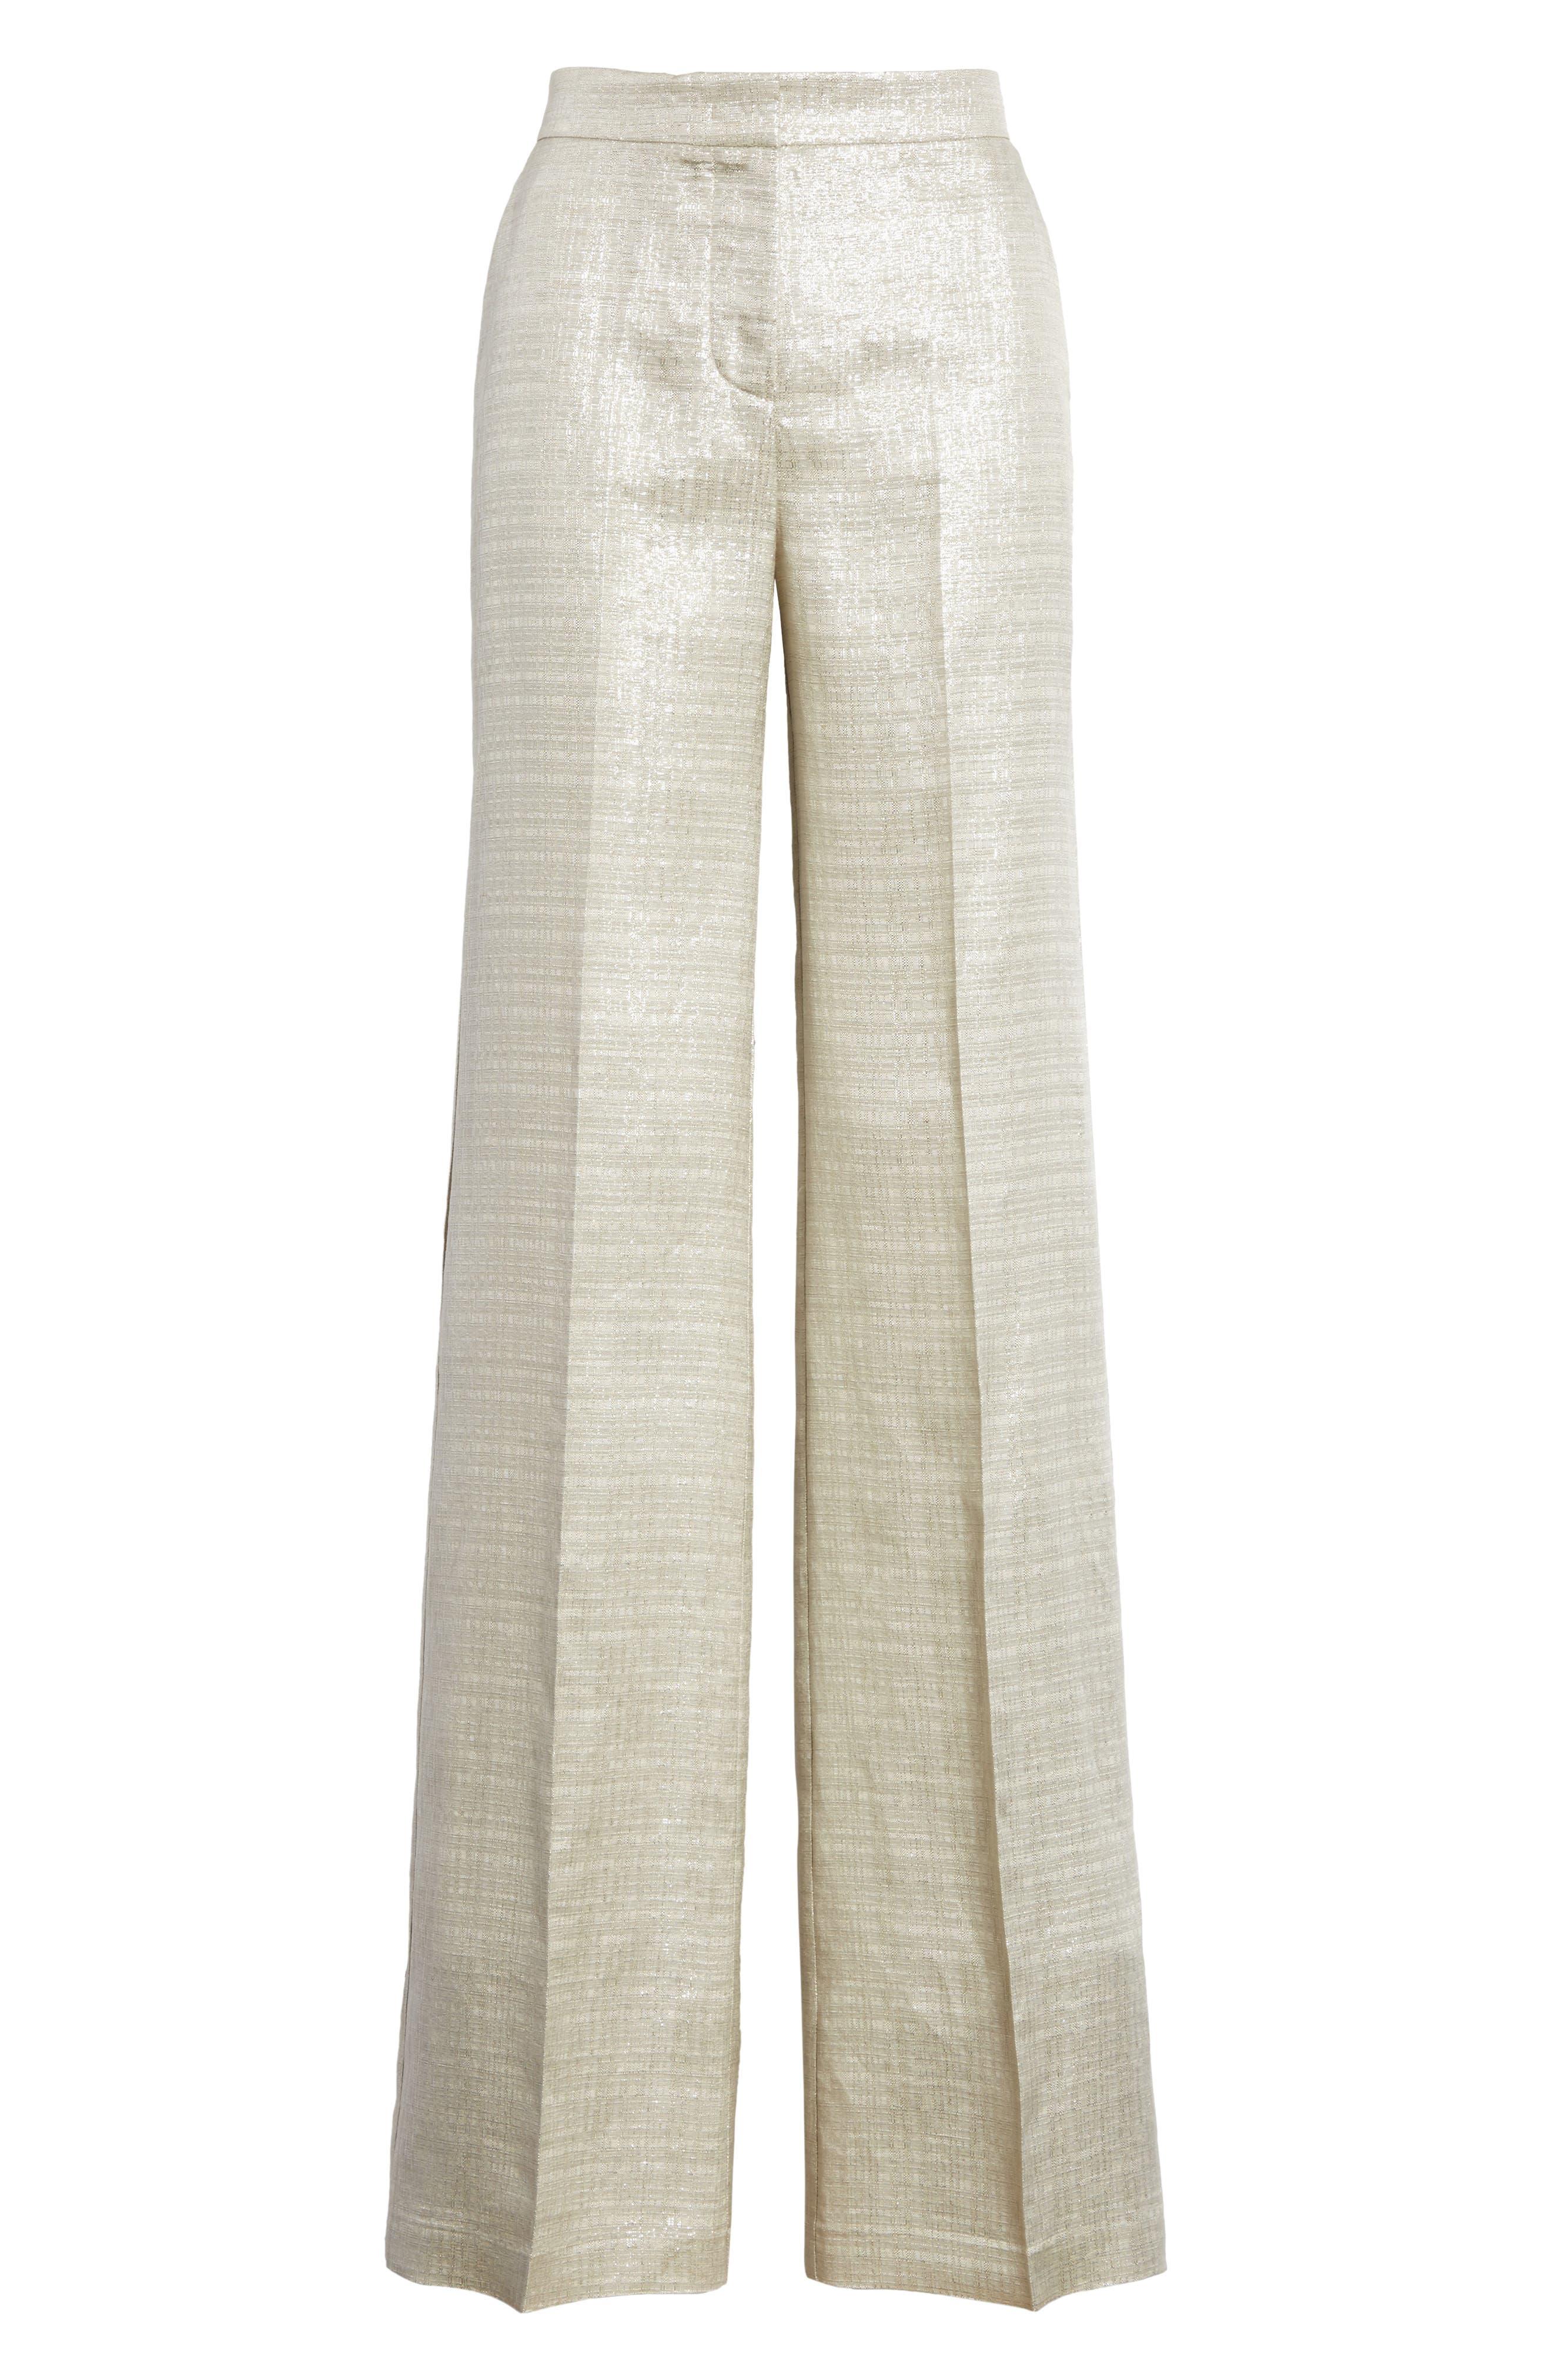 Metallic Wide Leg Pants,                             Alternate thumbnail 6, color,                             041